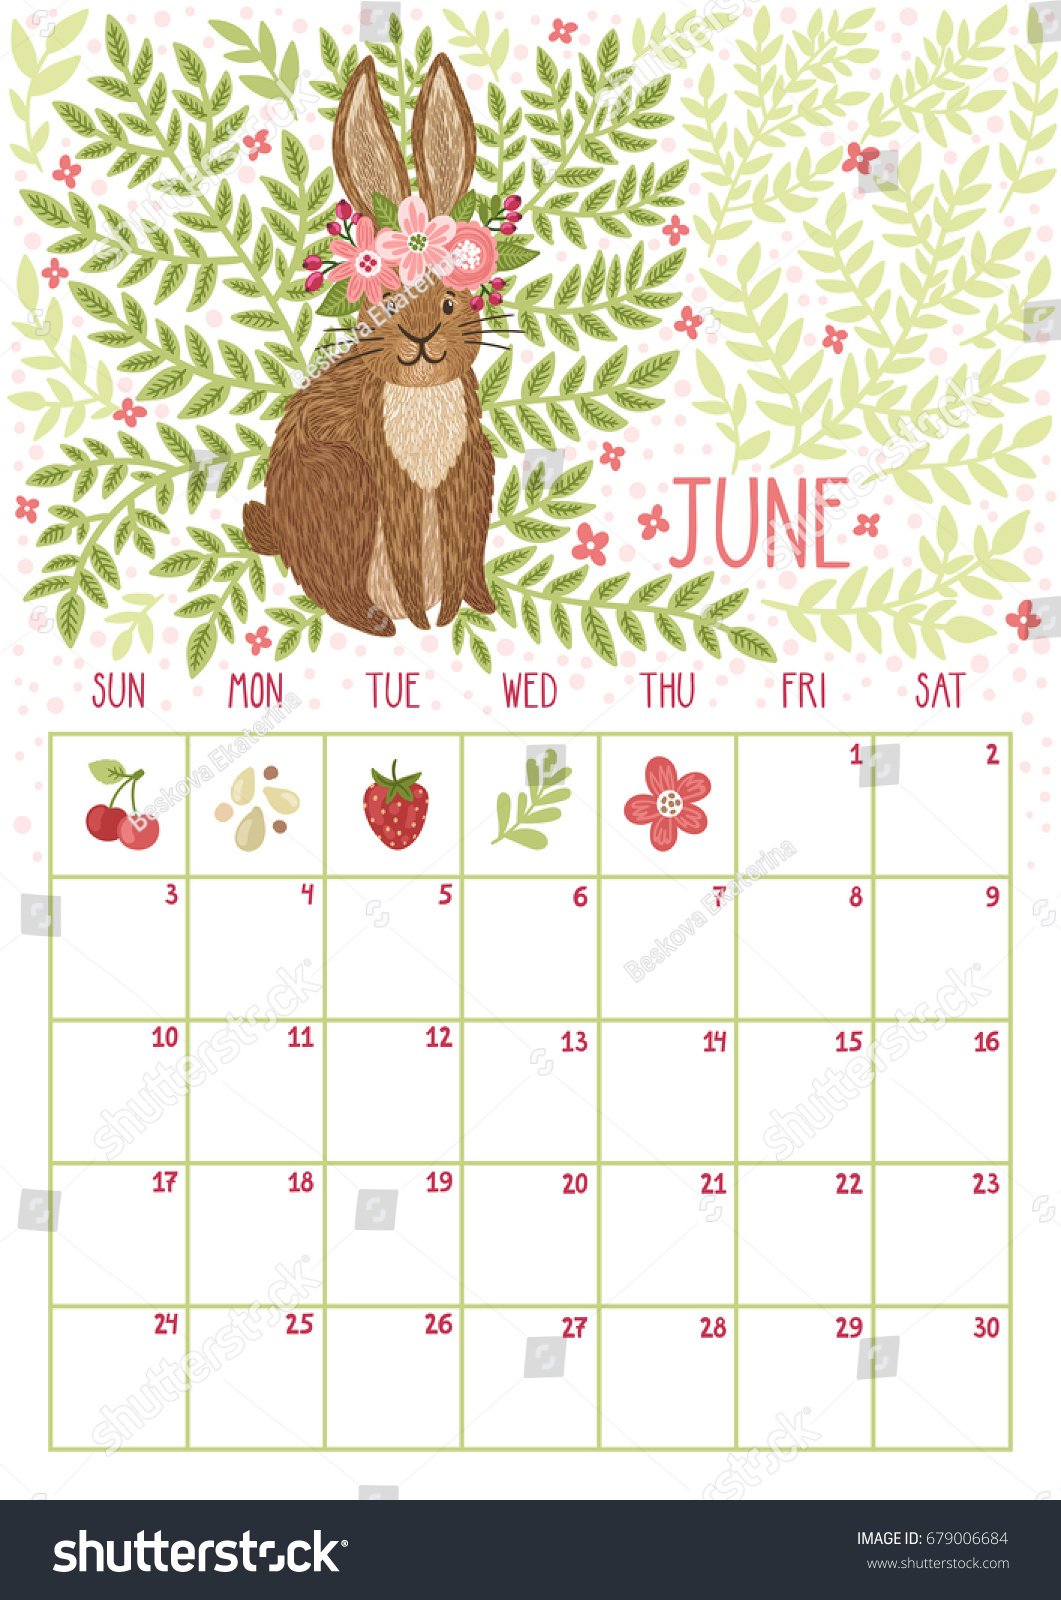 Weekly Calendar Cartoon : Vector monthly calendar cute rabbit june stock